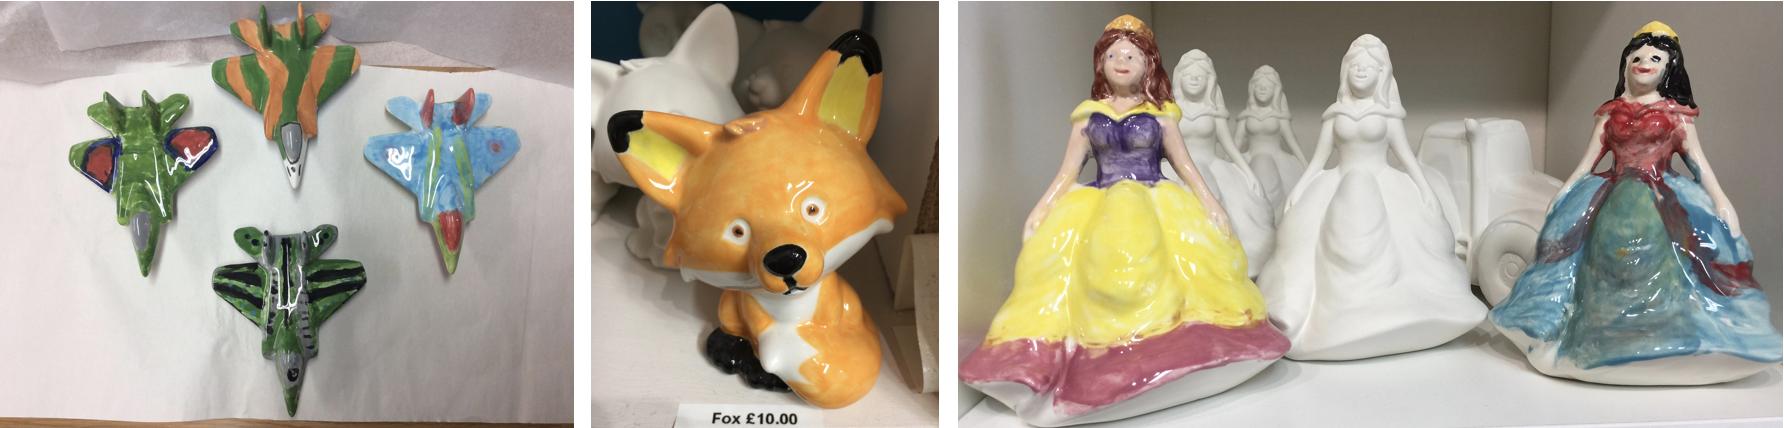 kilnwood-aeroplanes-fox-princesses